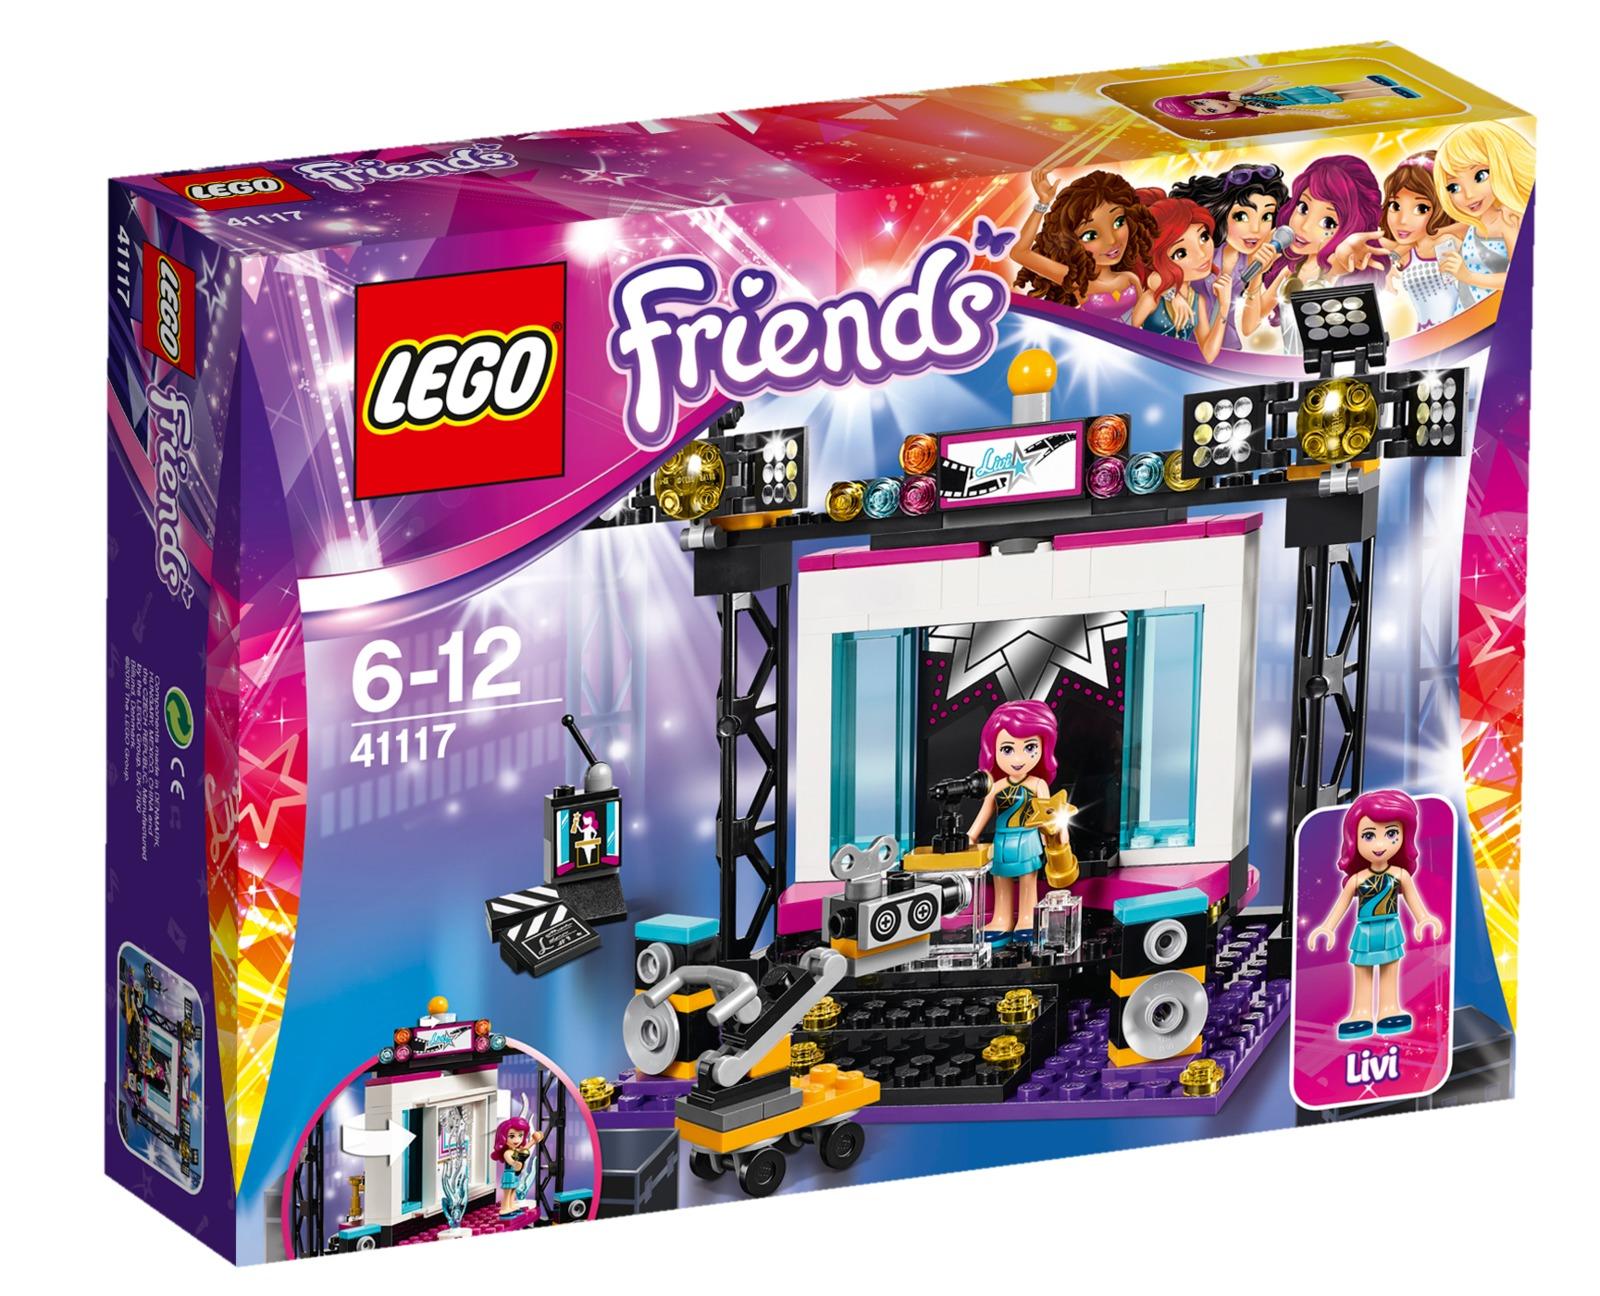 LEGO Friends - Pop Star TV Studio (41117)